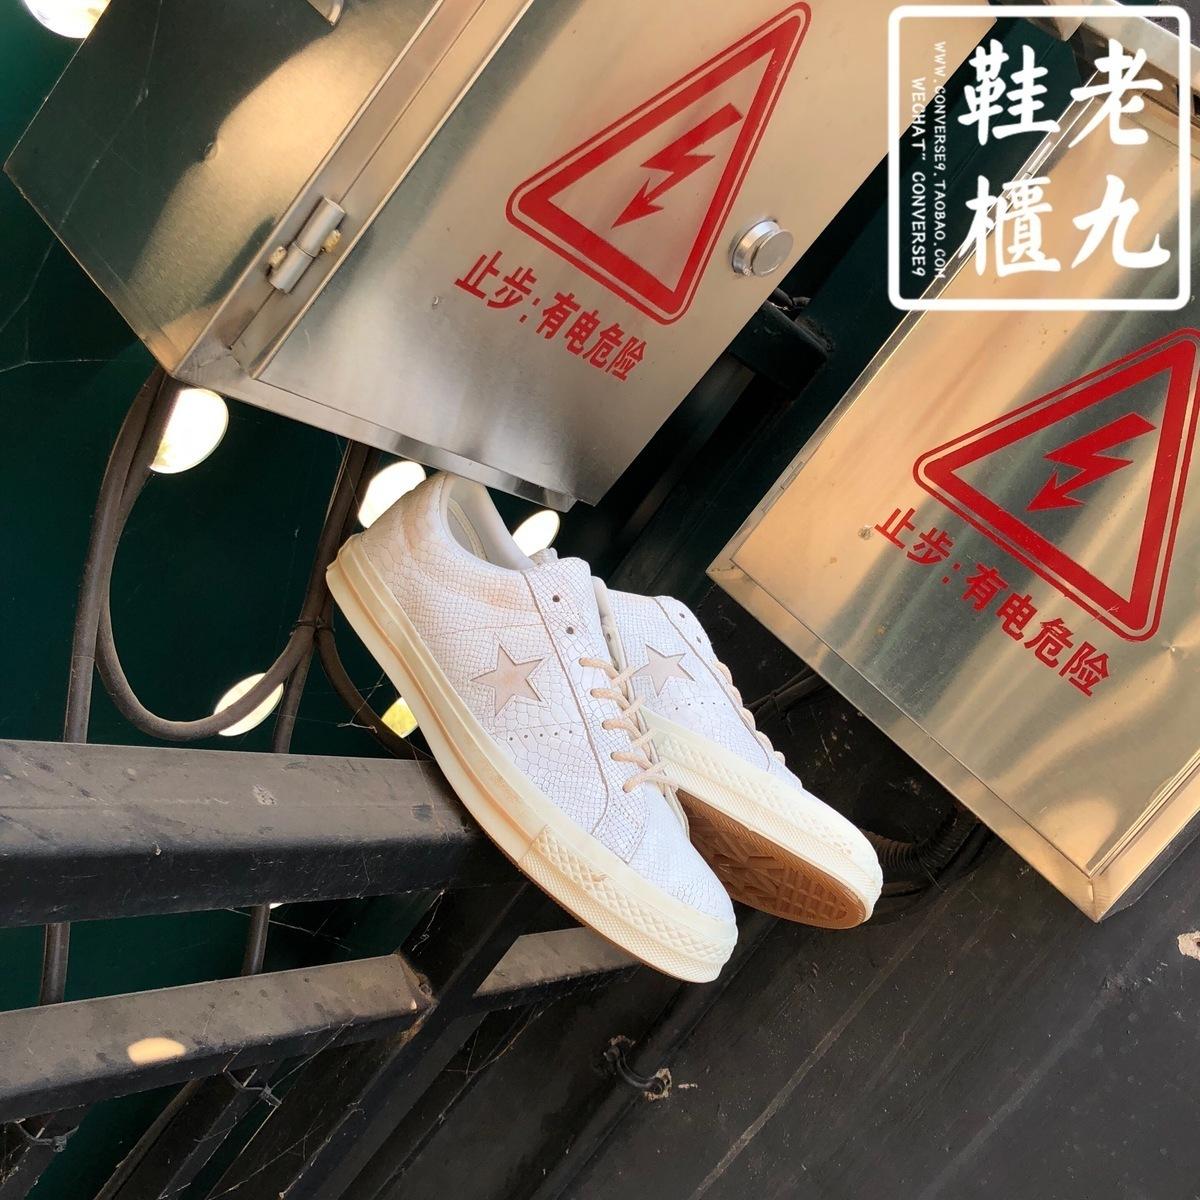 Converse匡威 one star 74 米白色蛇纹牛皮低帮男女帆布鞋161545c